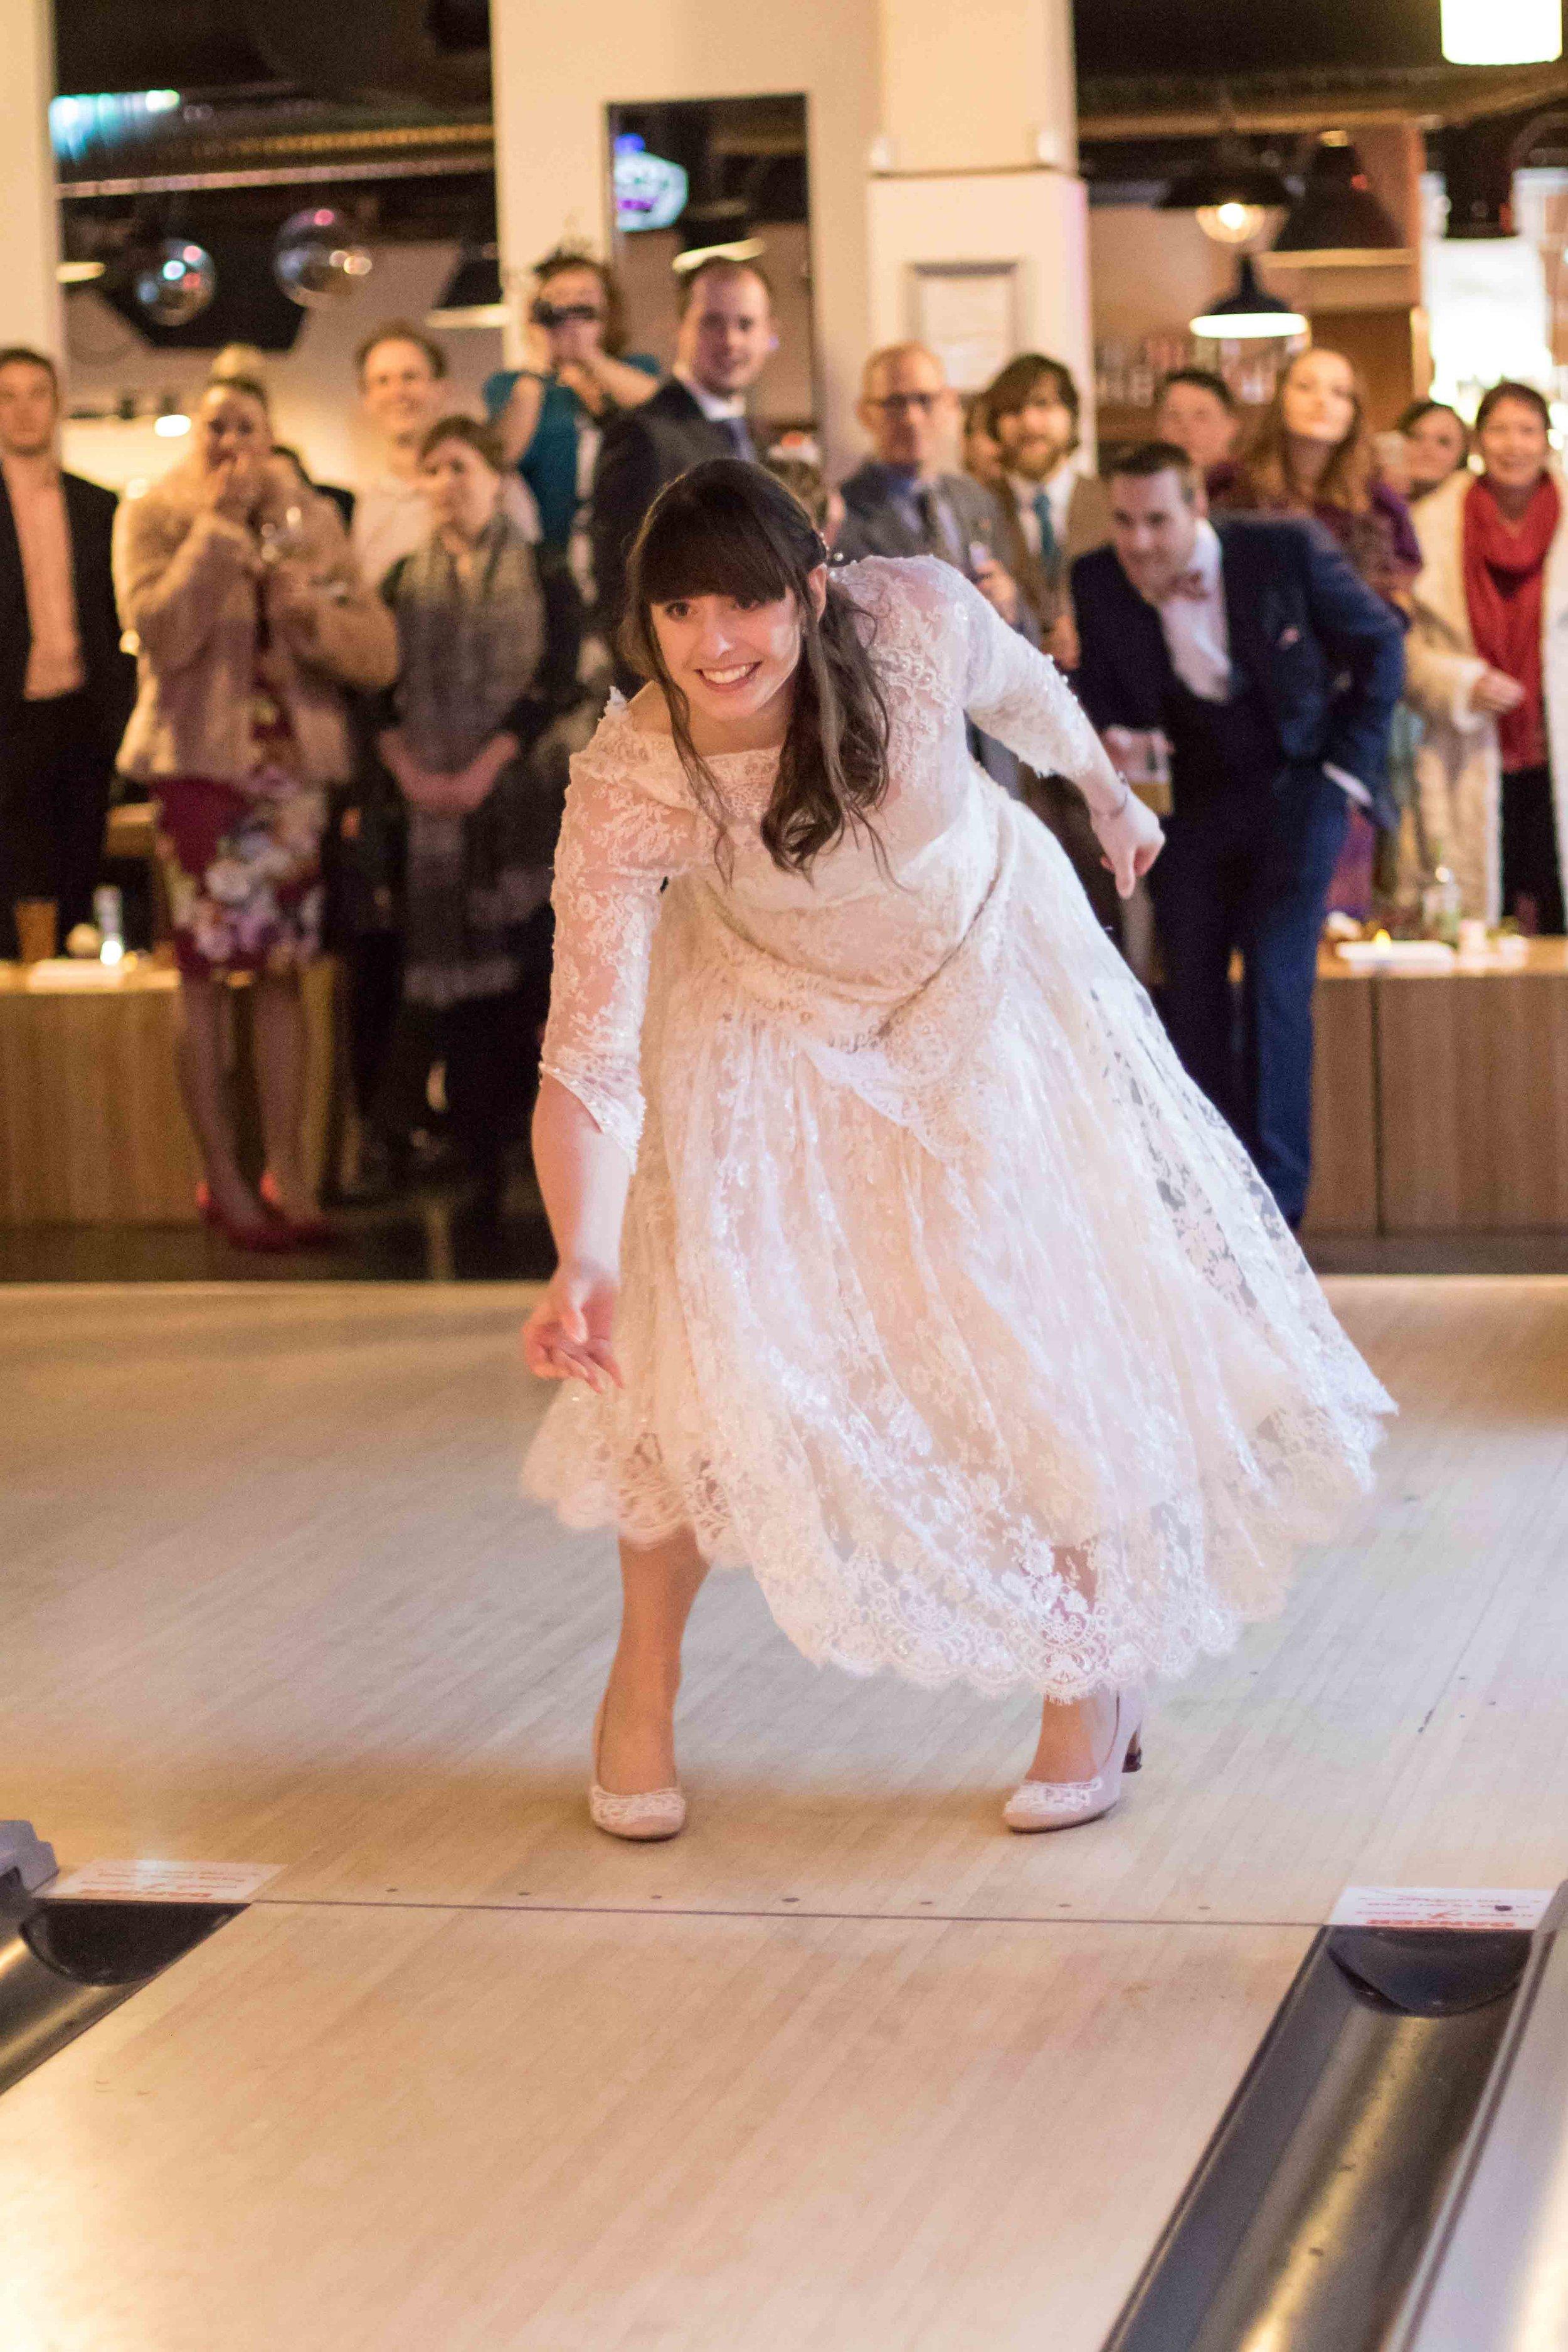 Adam & Faye - Wright Wedding Photography - Bristol Wedding Photographer -360.jpg